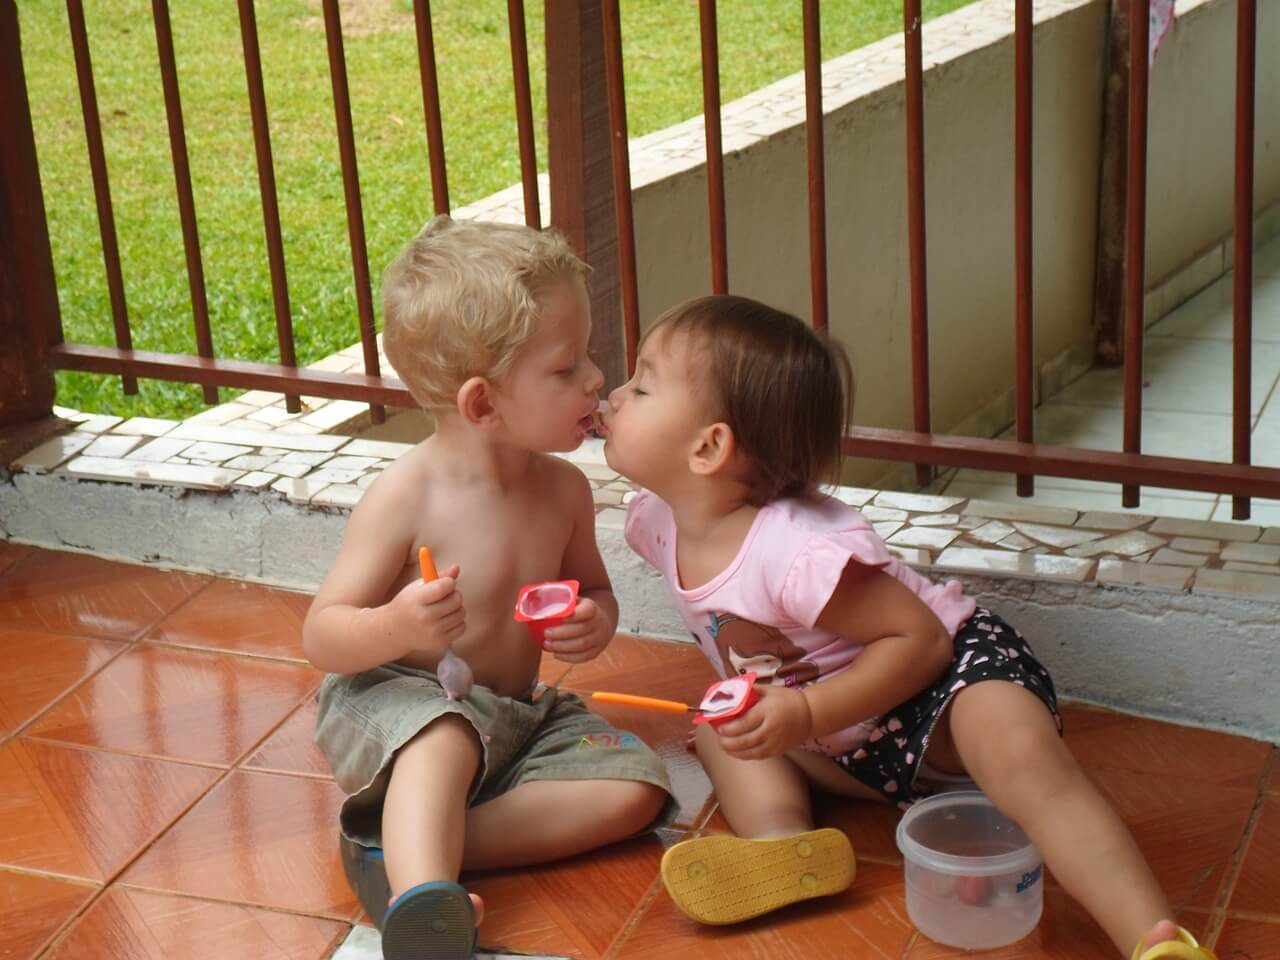 Erste Kuss Dating-Fragen